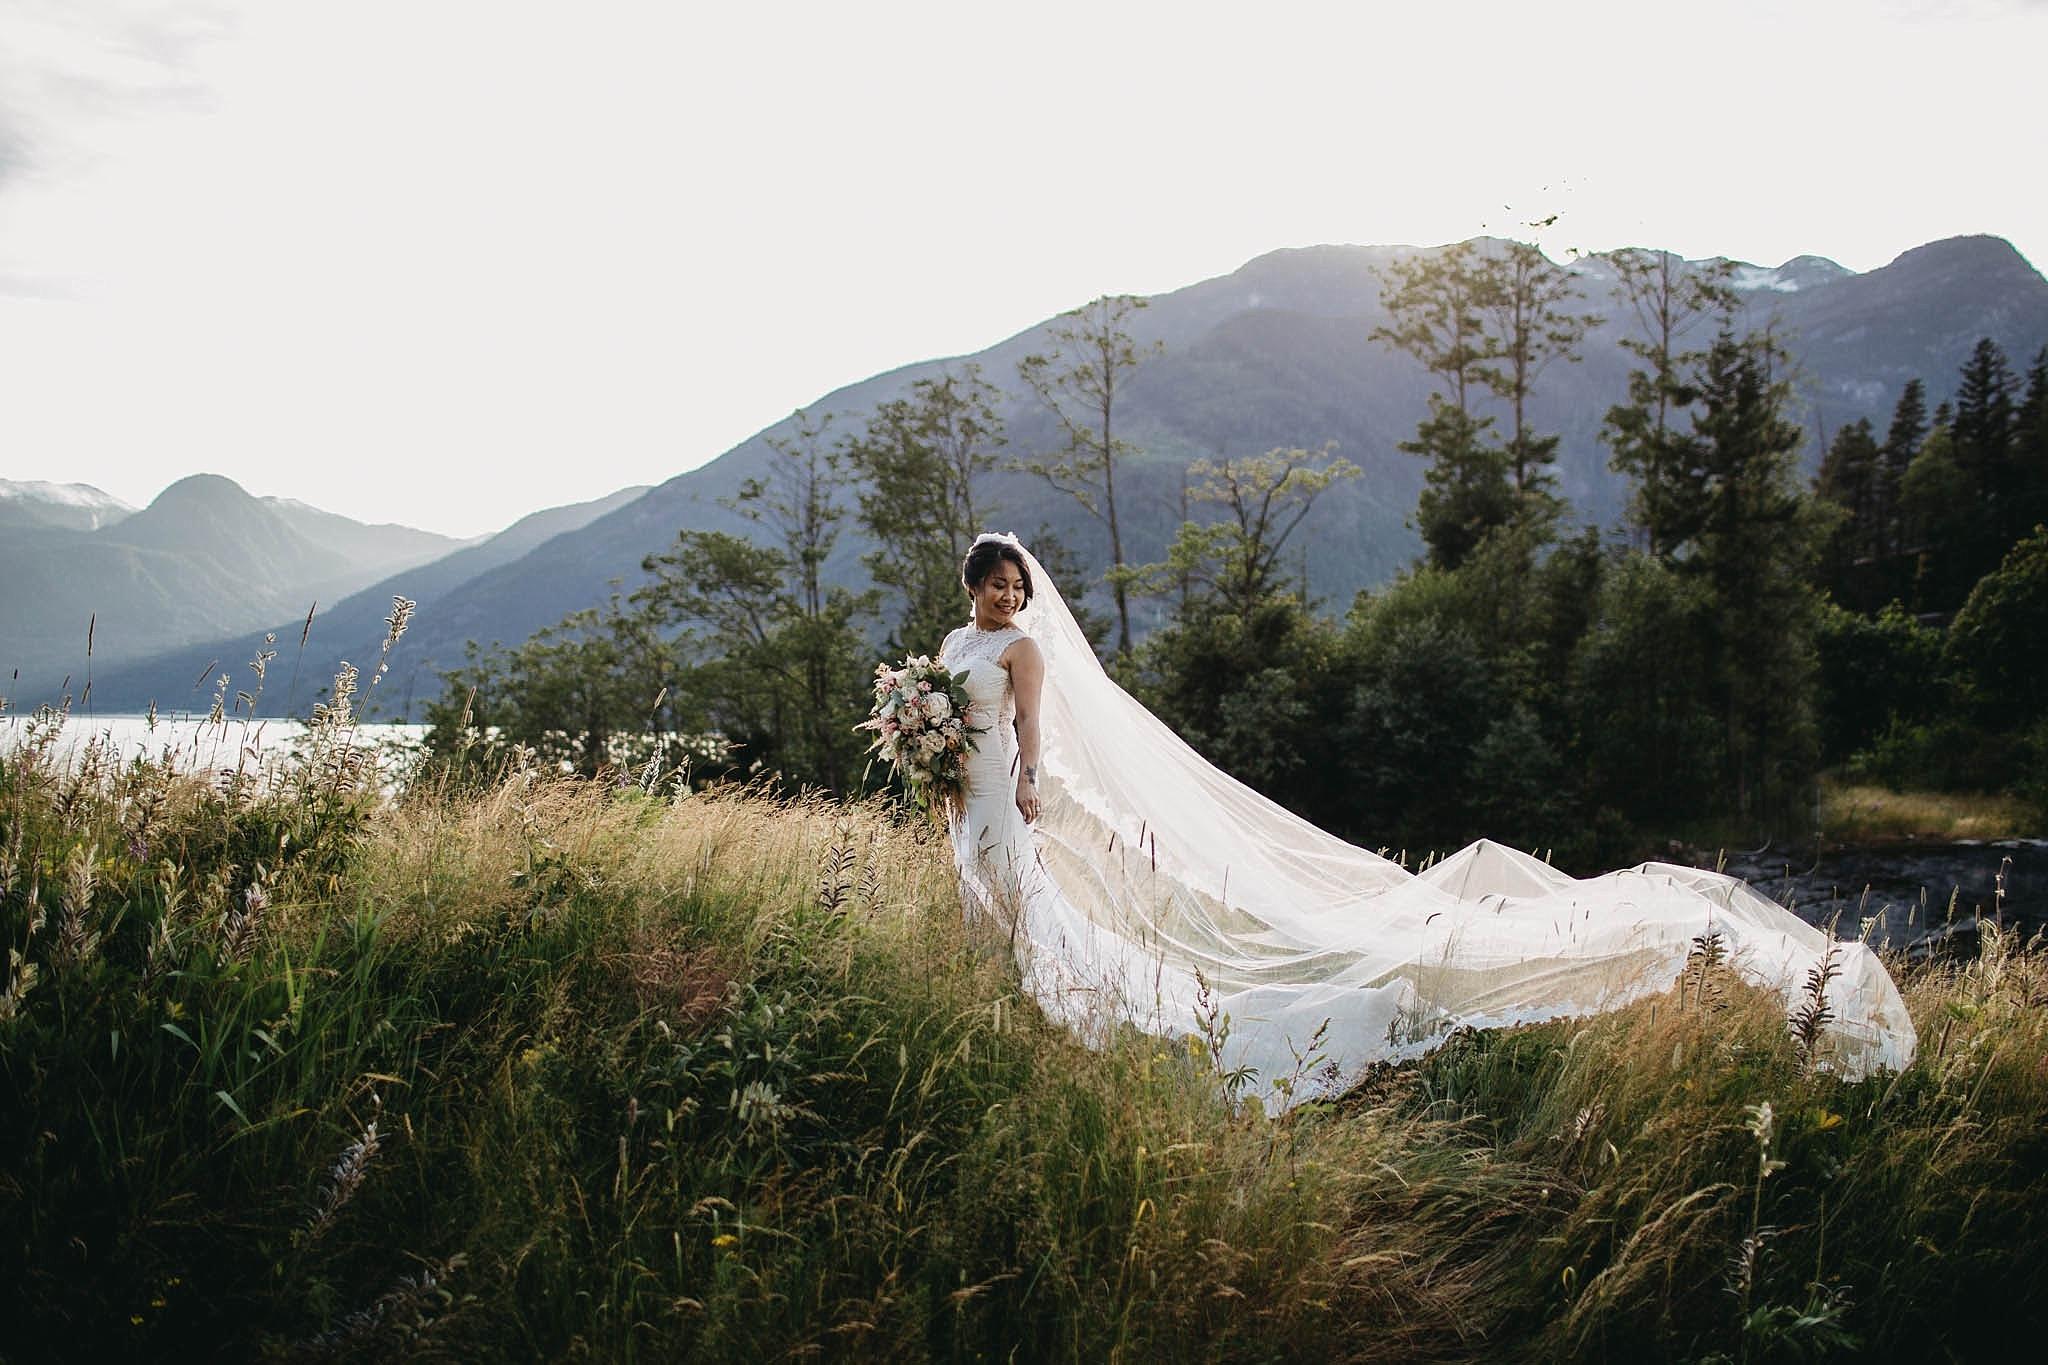 aileen-choi-photo-hart-house-wedding_0092.jpg